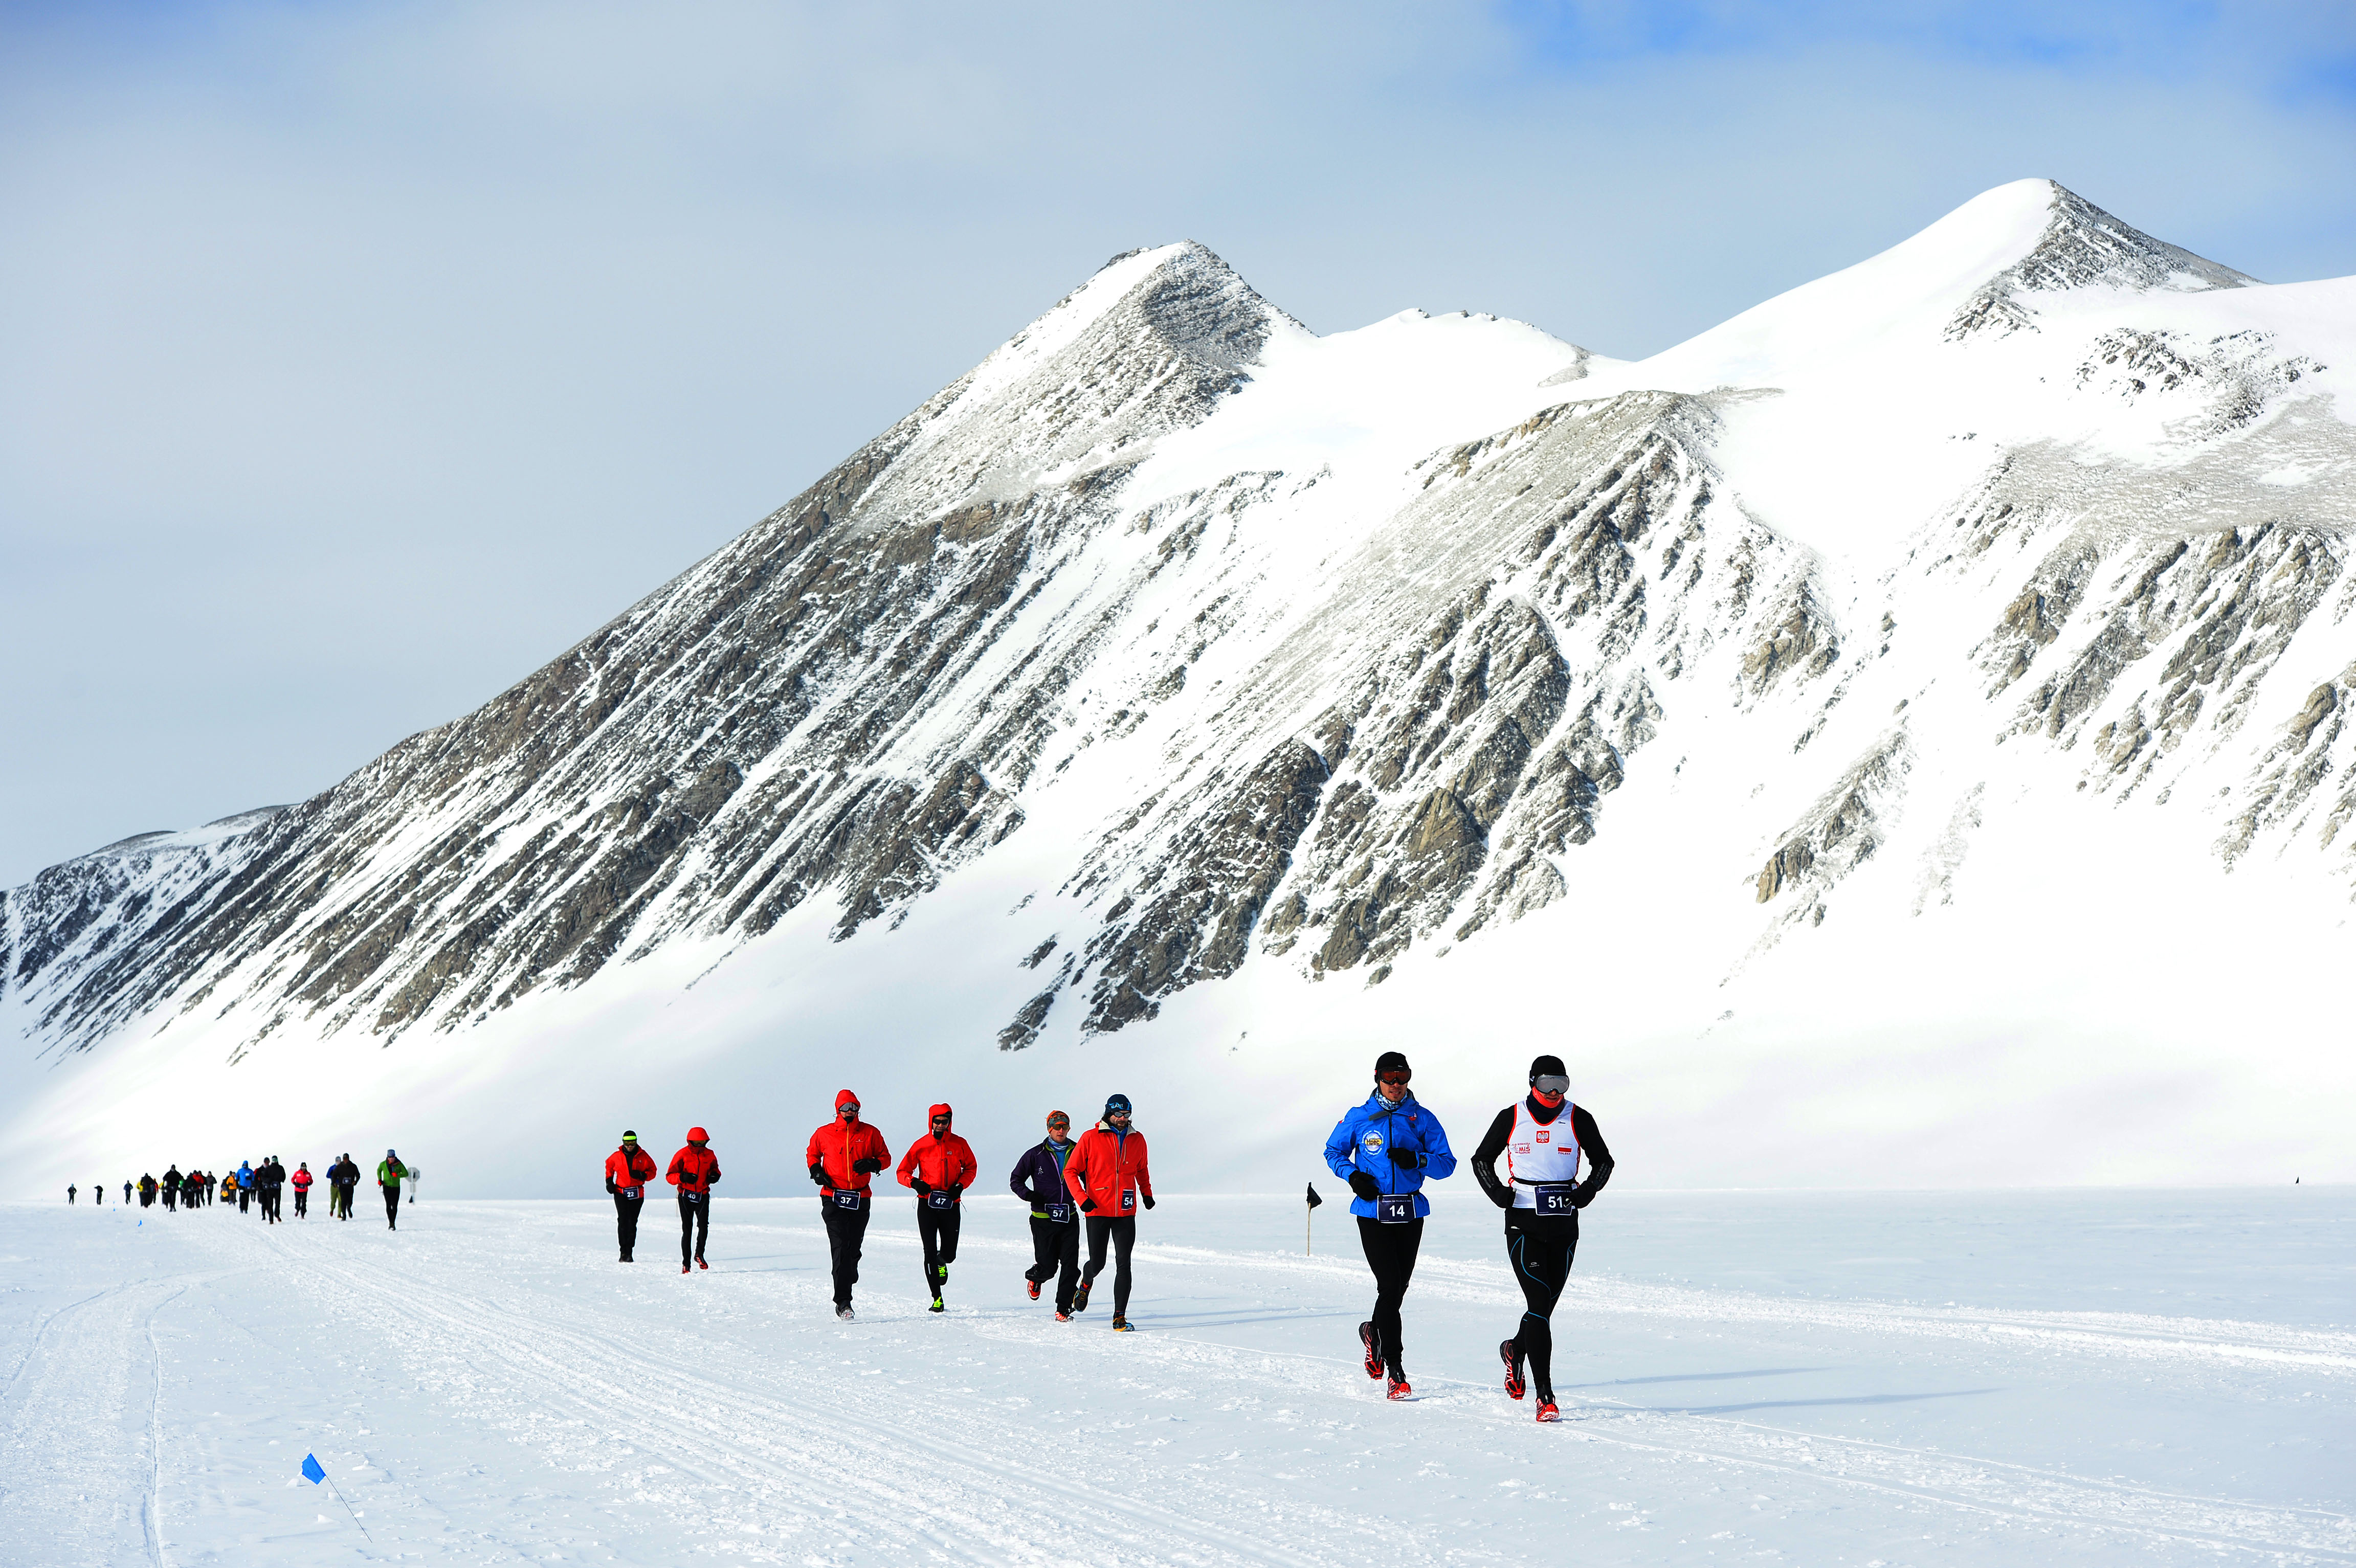 antarctic 100k ultra race